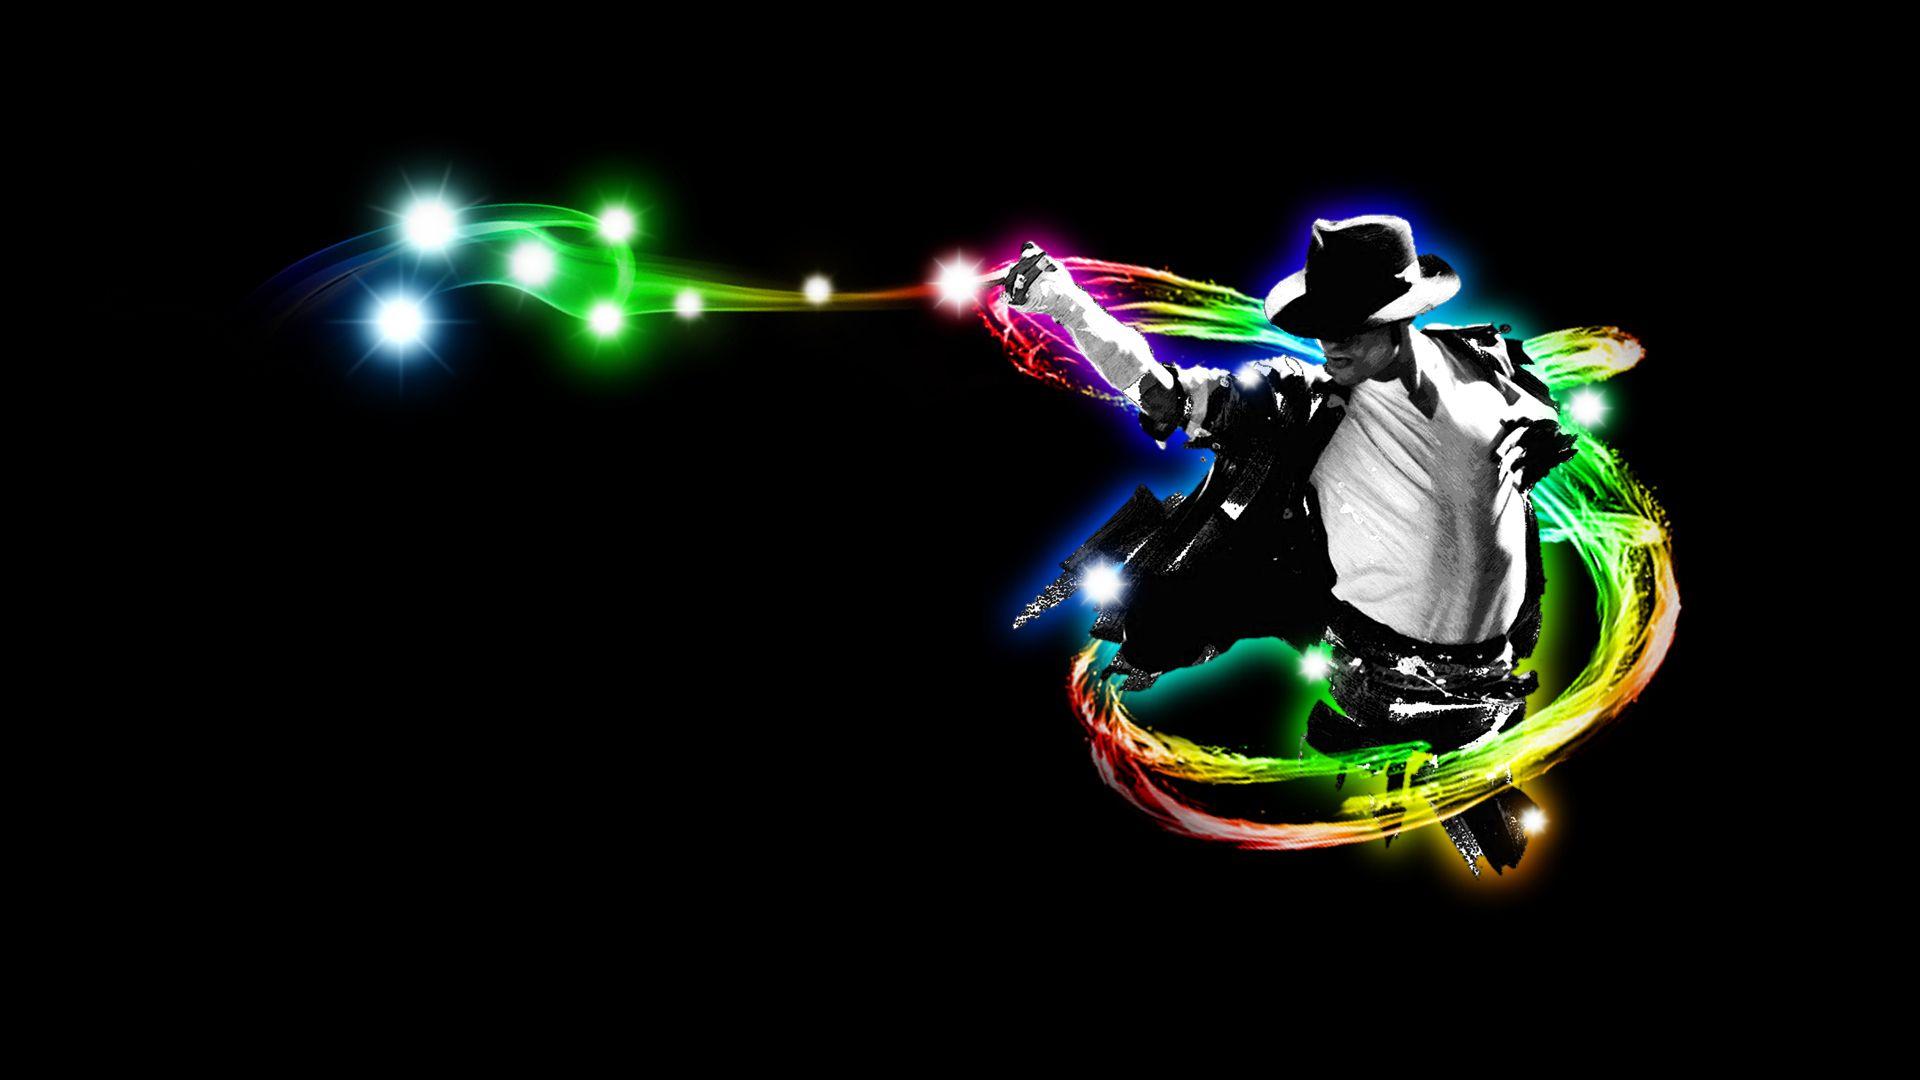 ♥MJ♥ 191 KING OF POP Michael jackson wallpaper, Michael